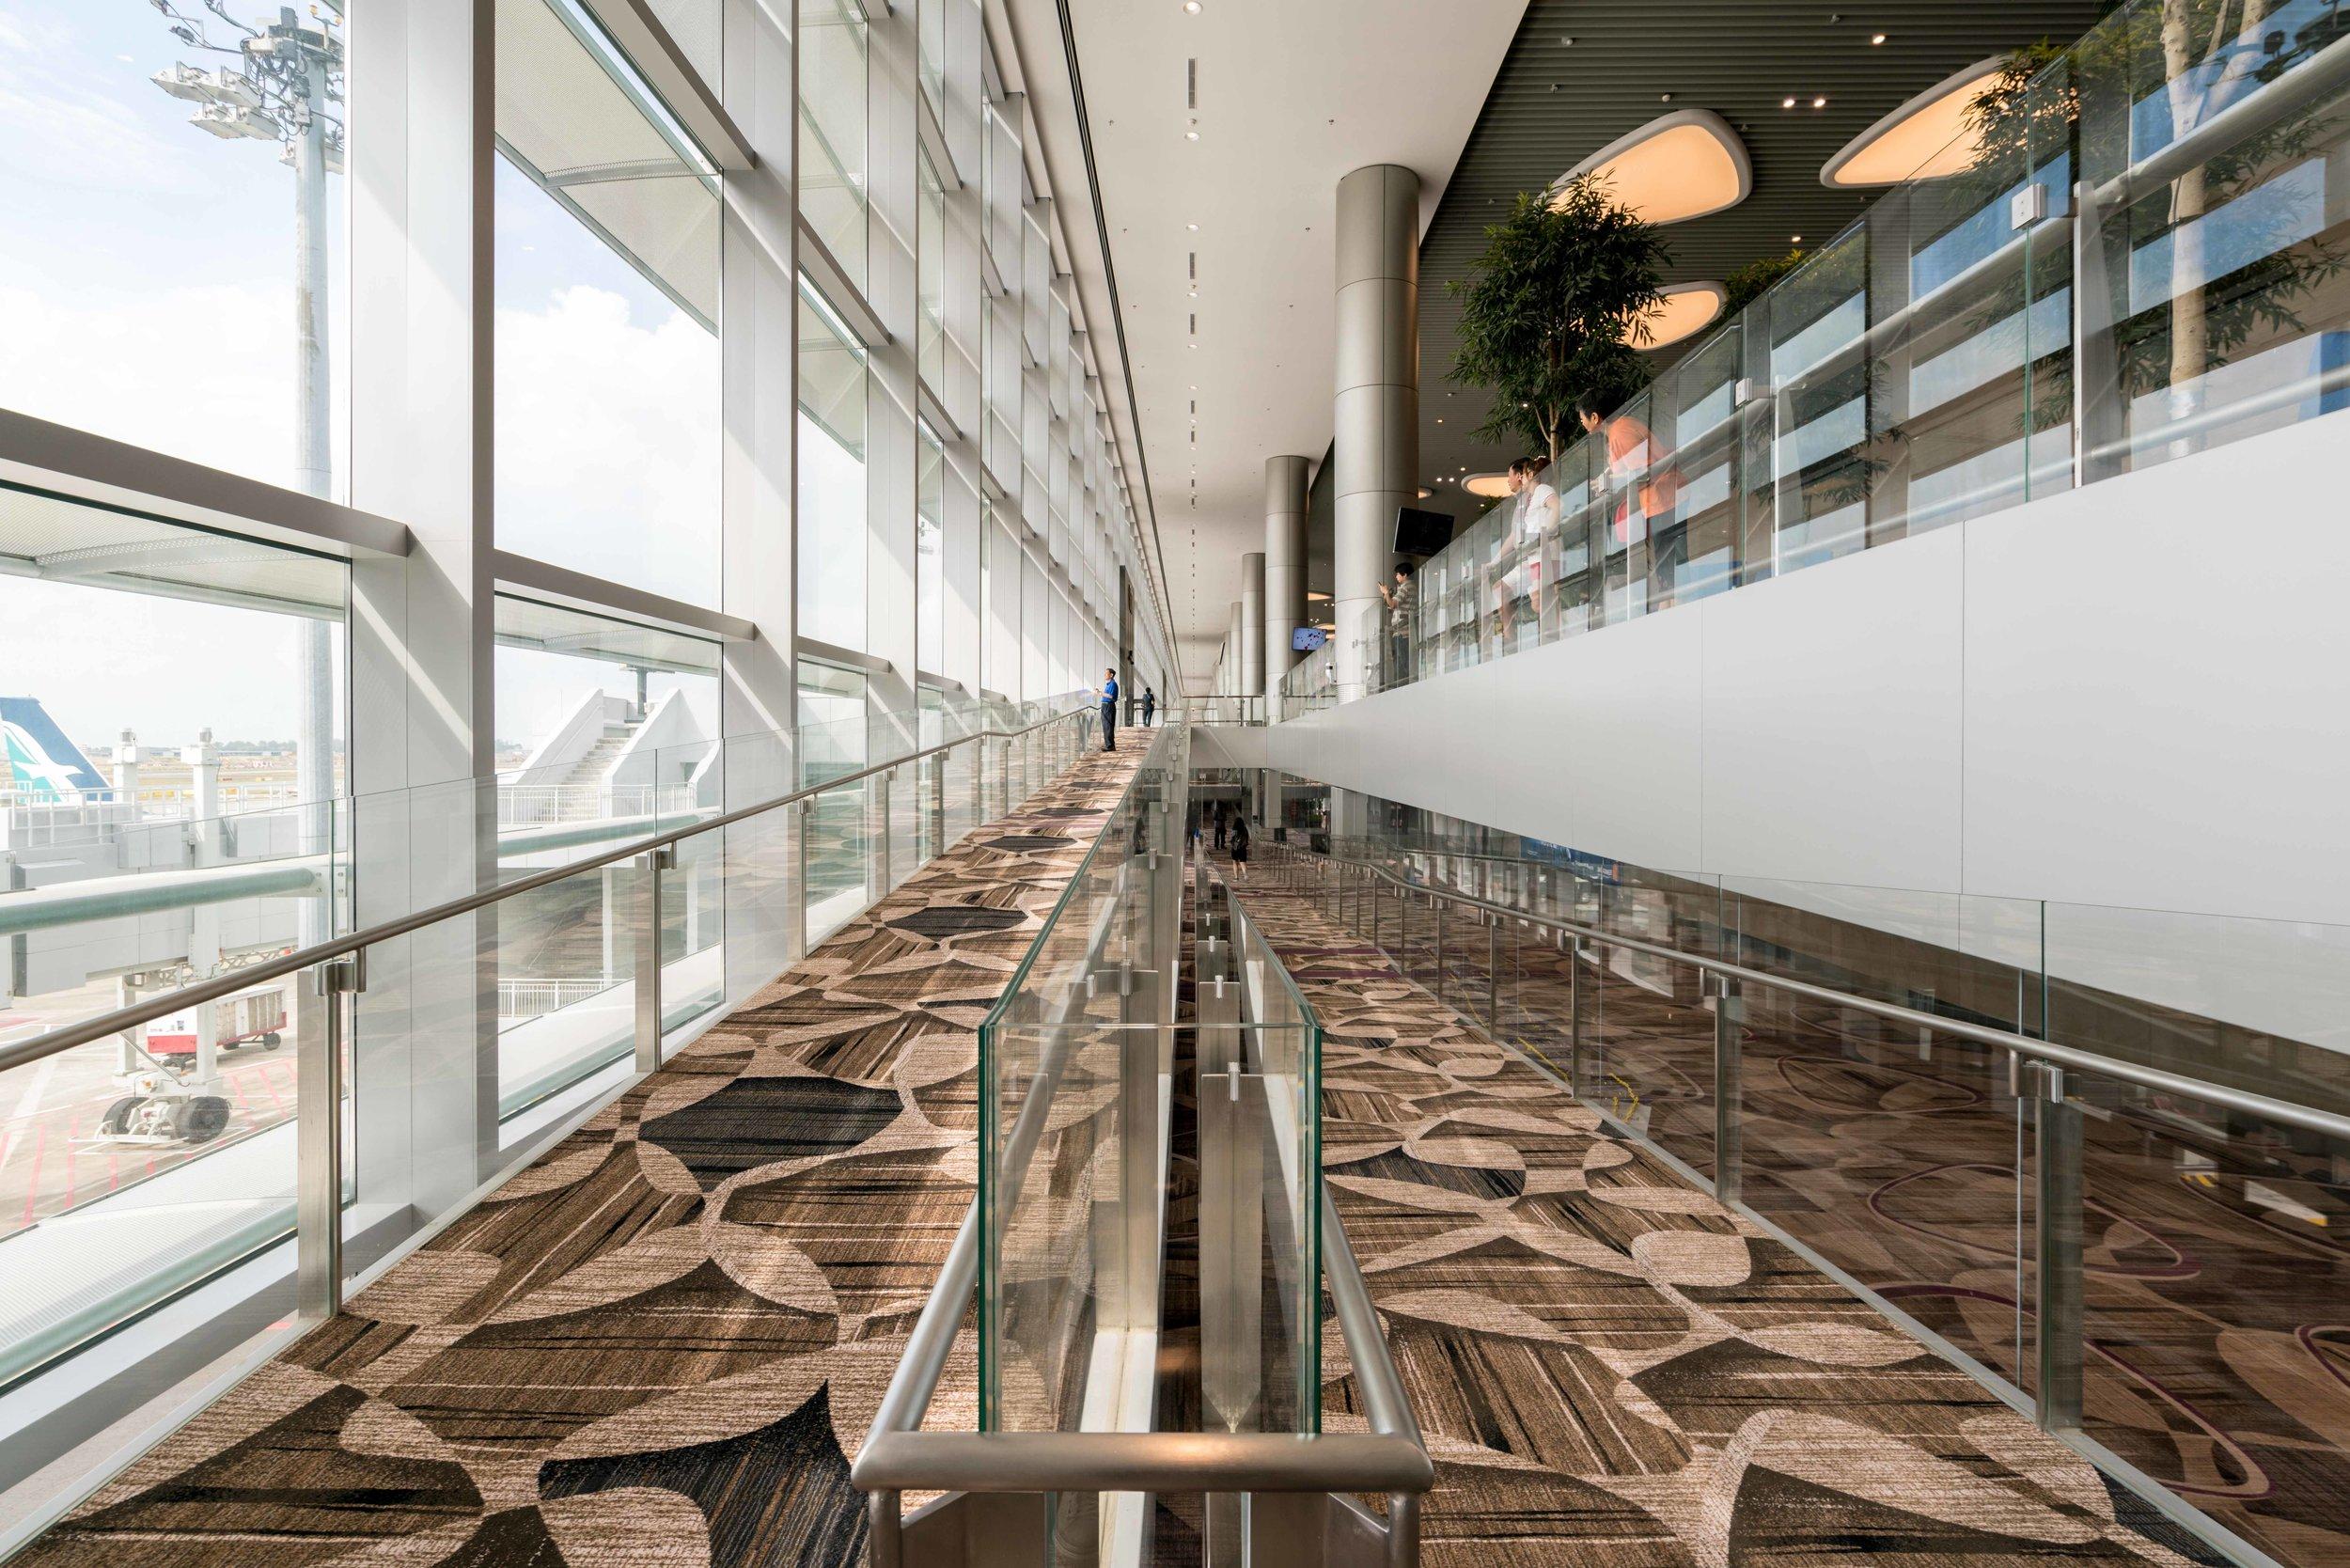 Changi-Airport-Terminal-4-14.jpg